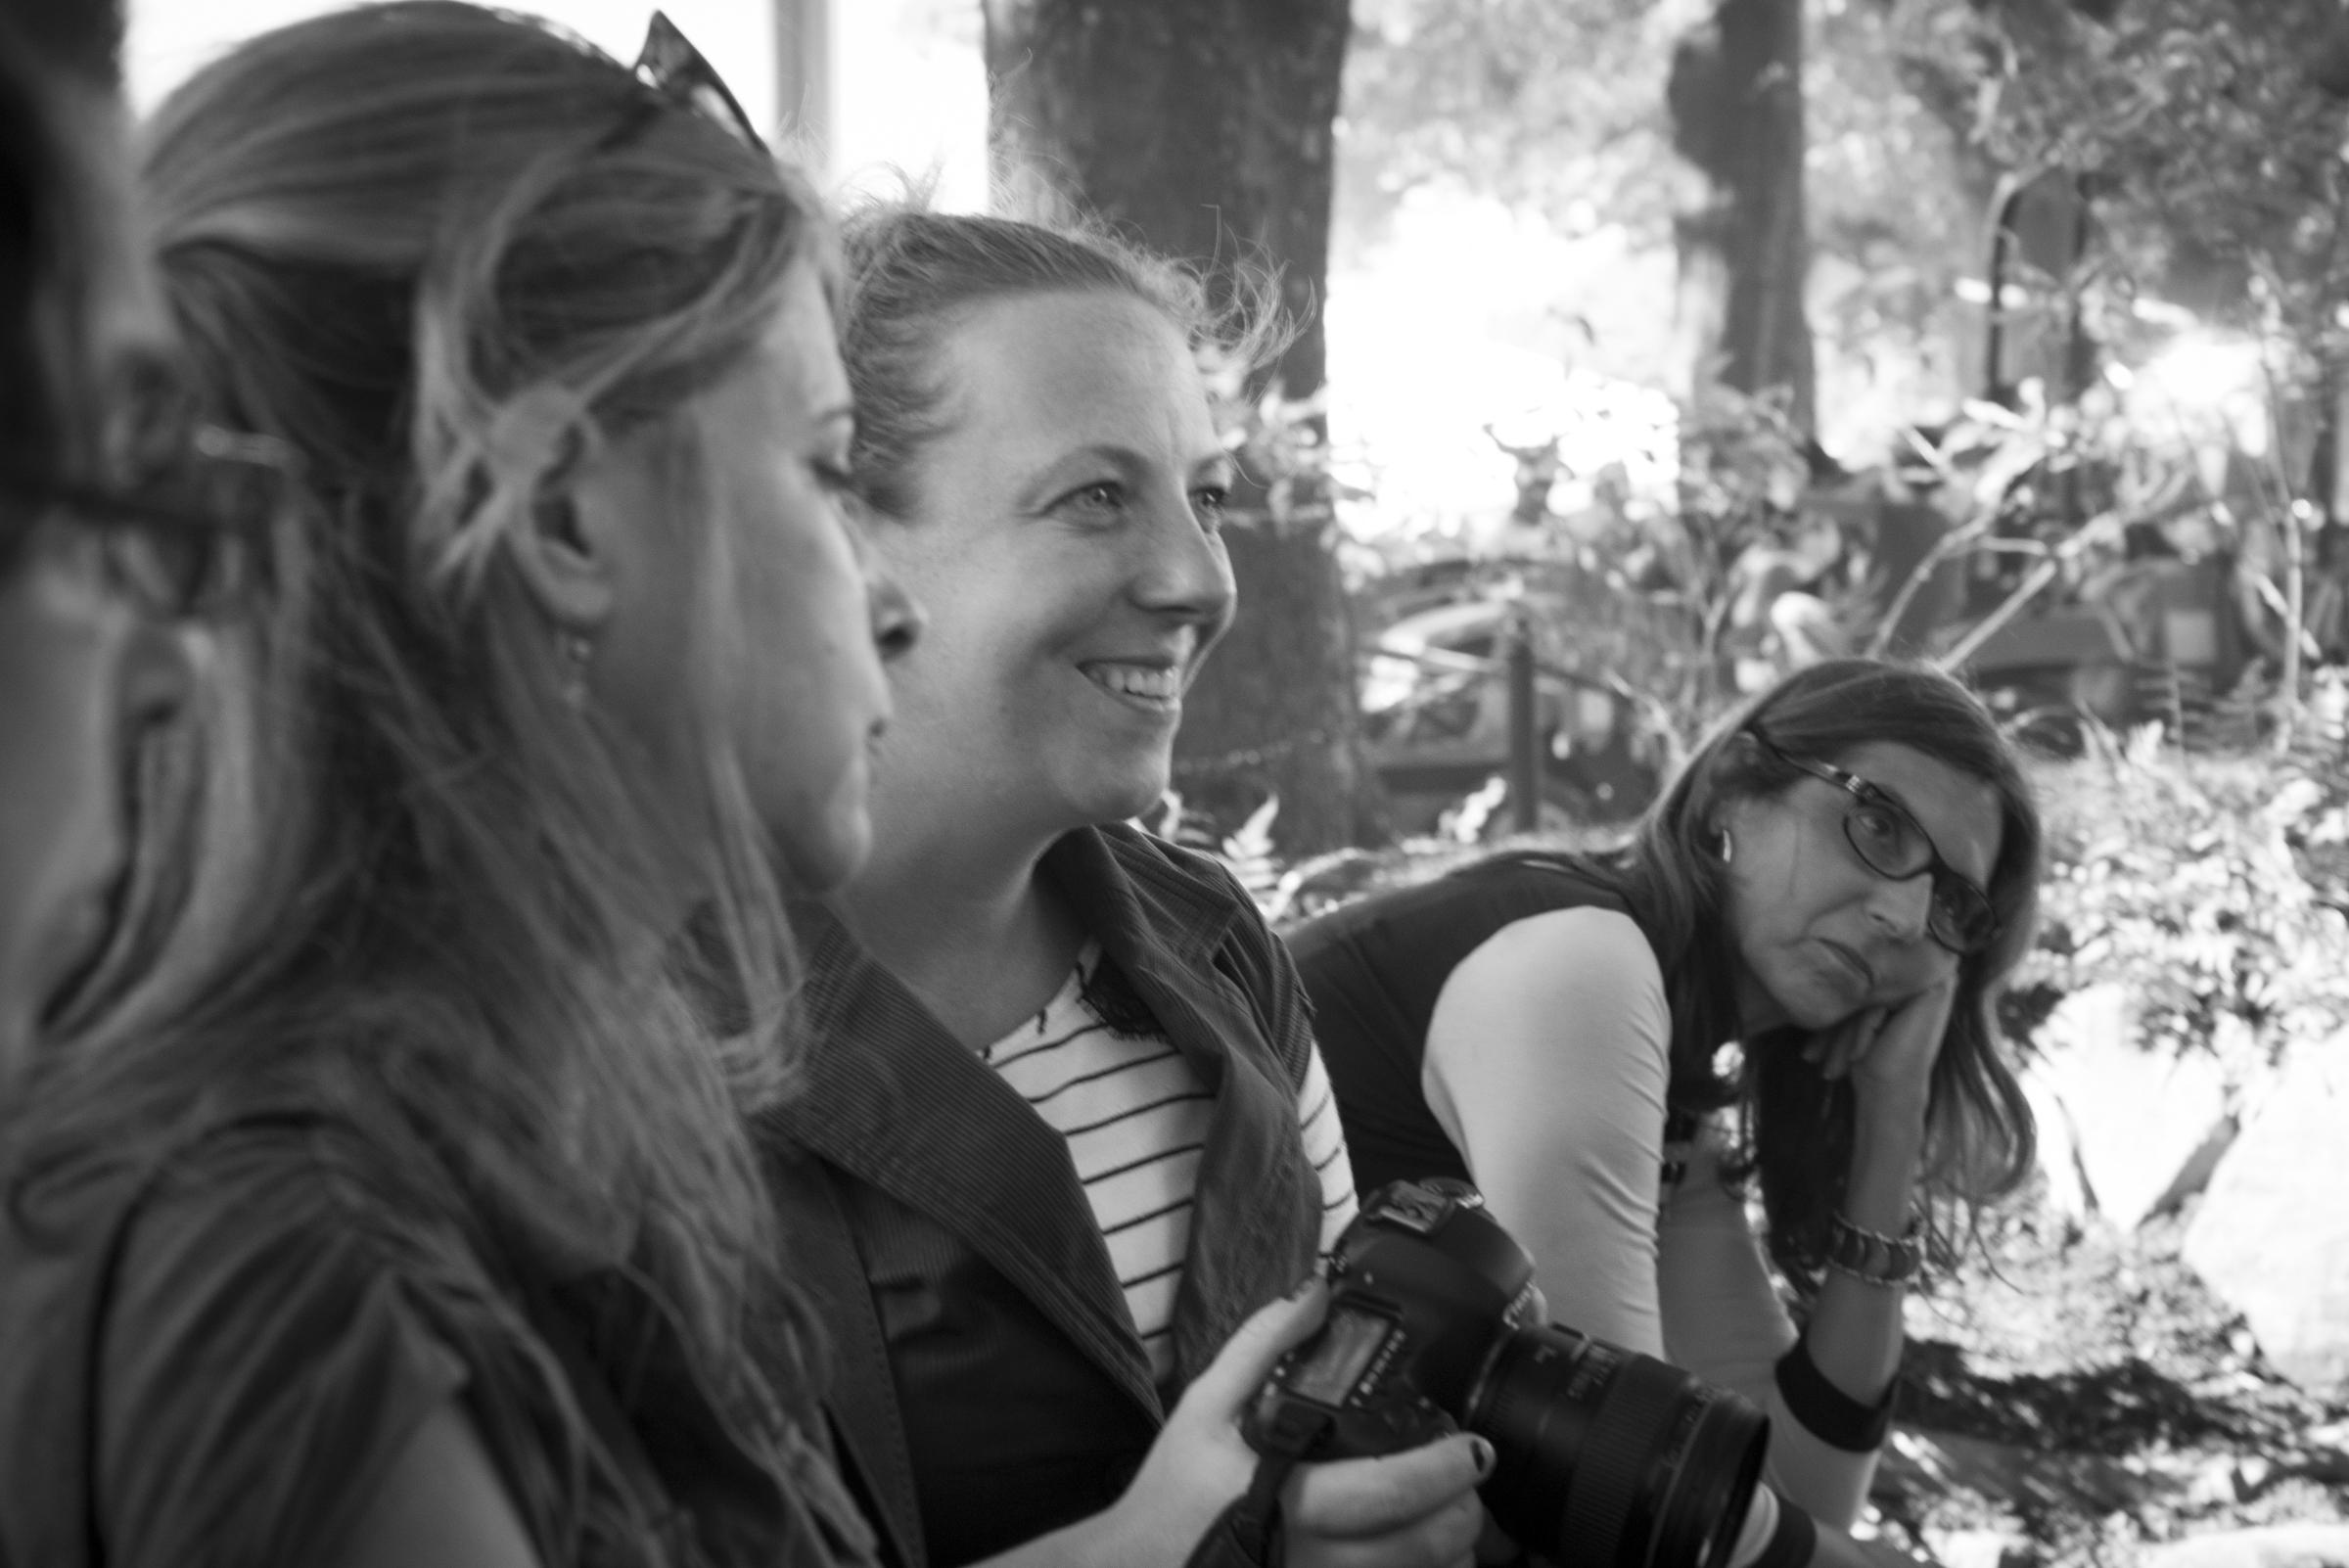 08252013-CarnivalScene-JuliaLuckettPhotography-24